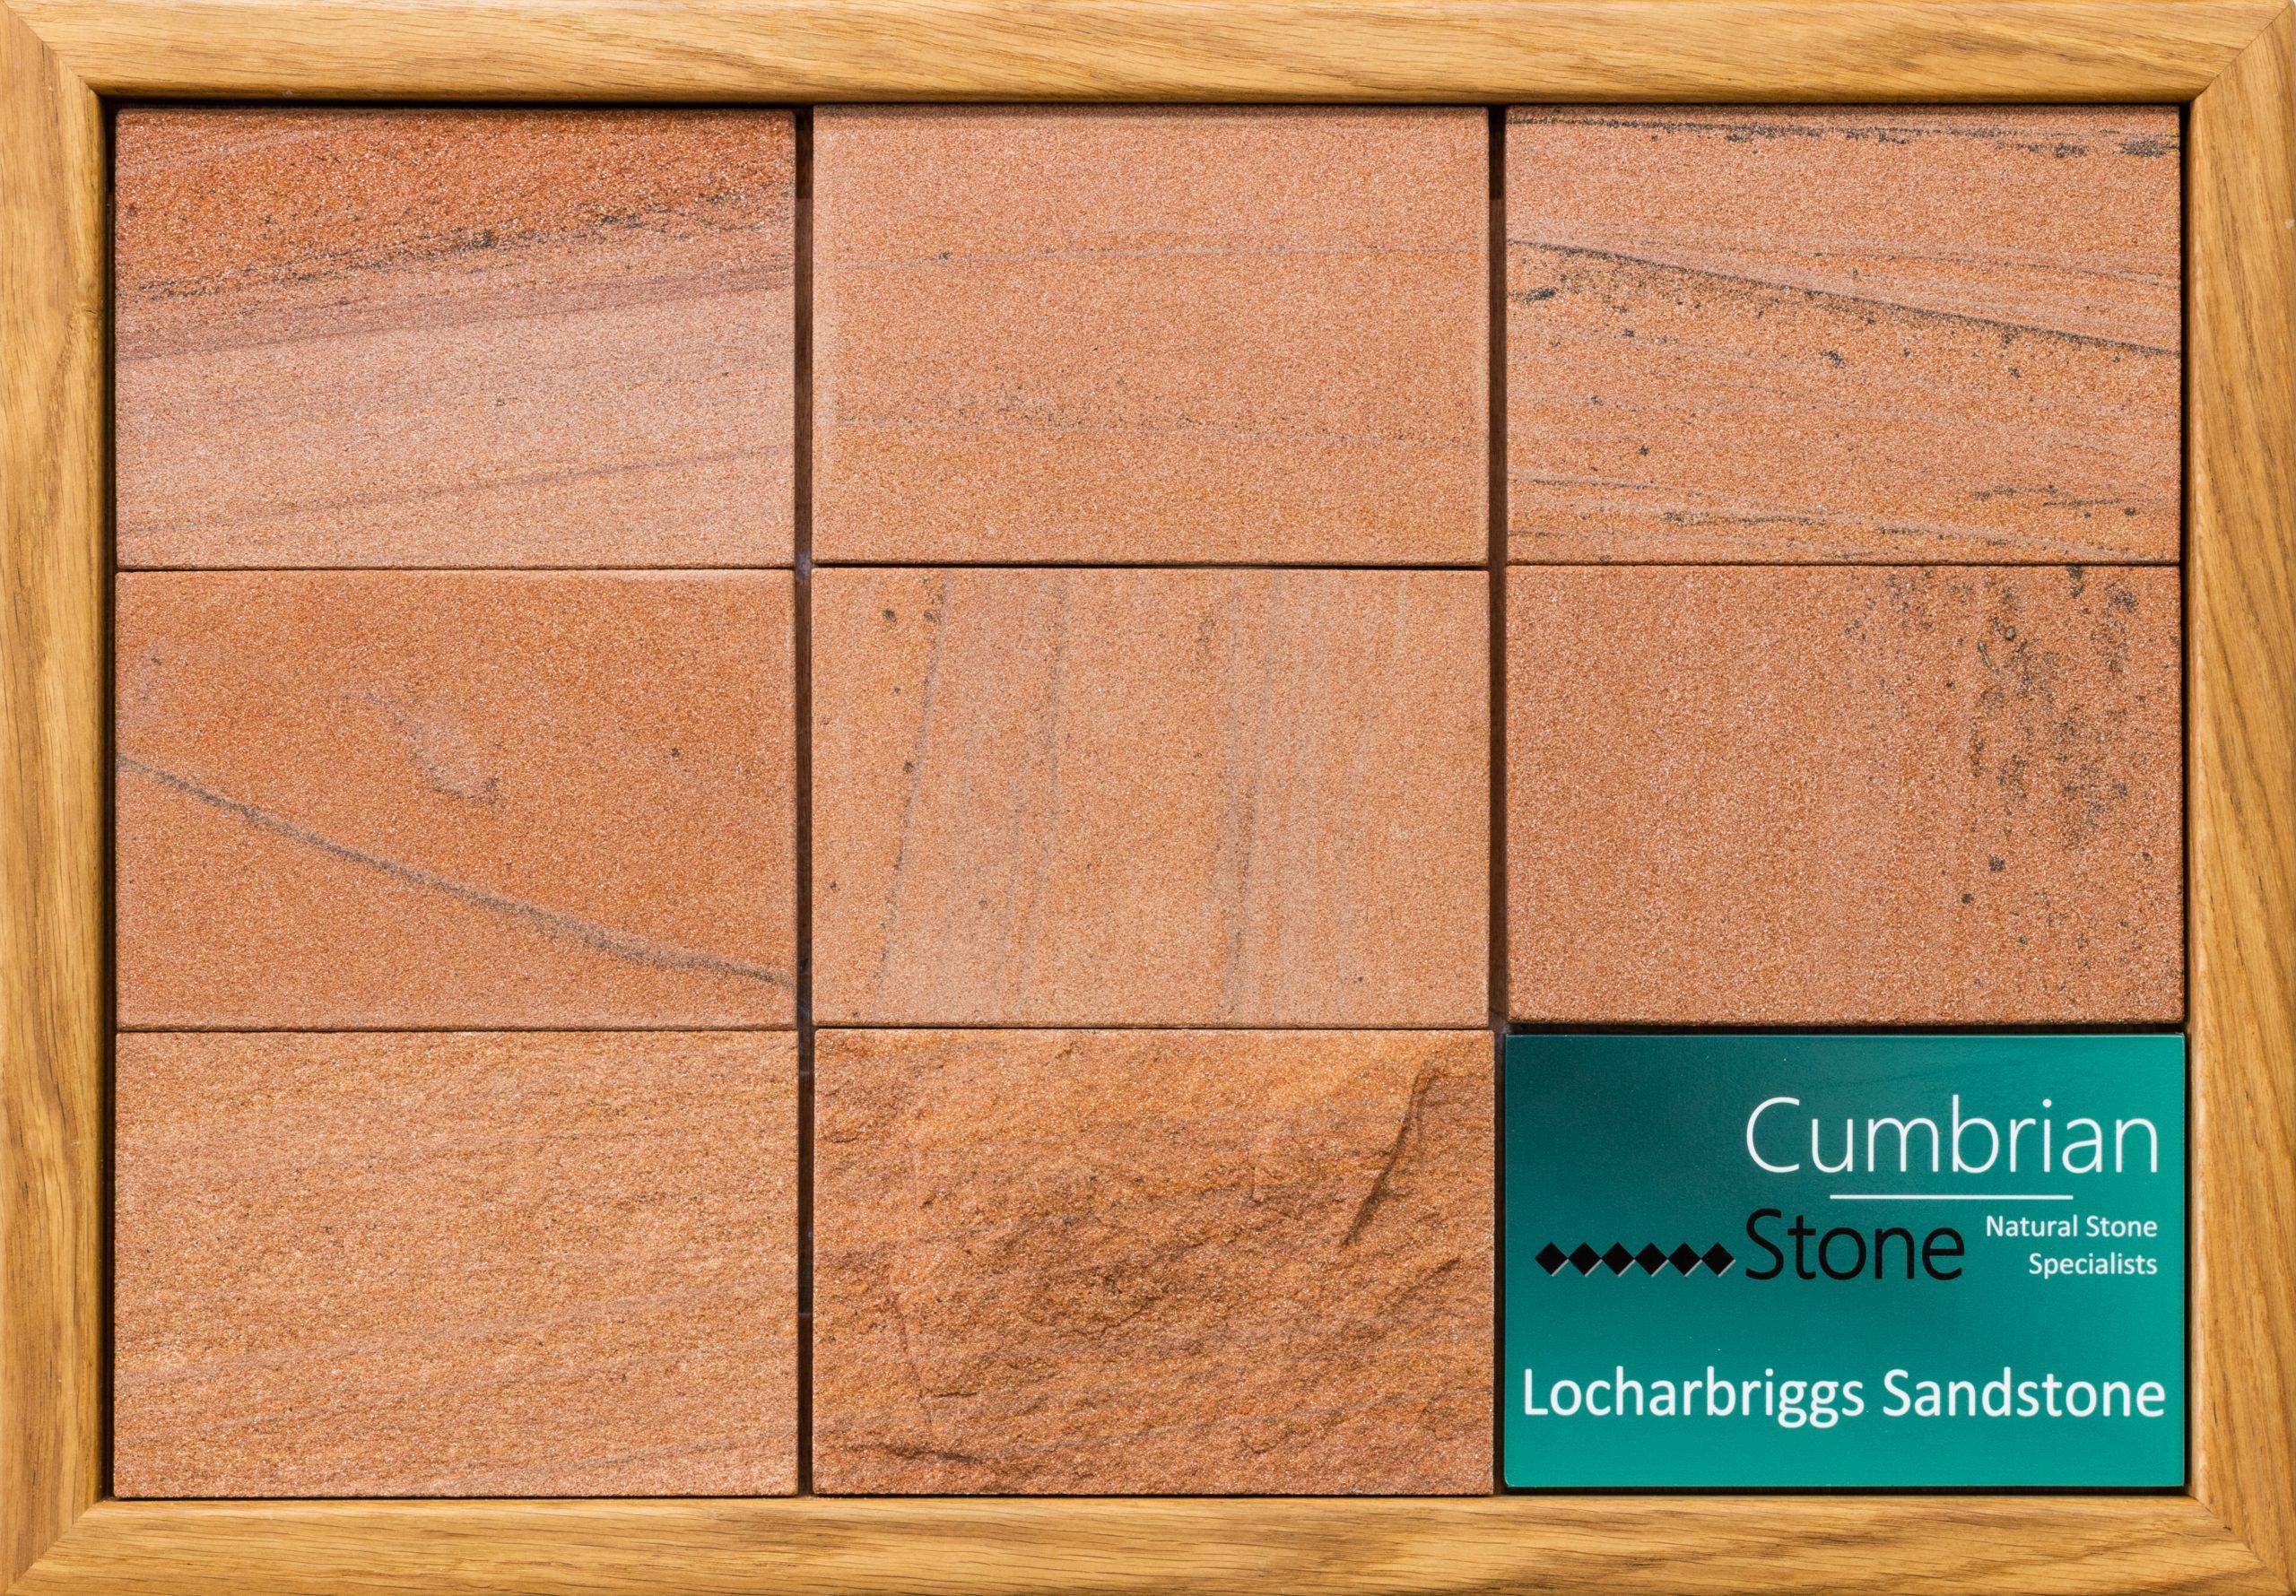 Locharbriggs Sandstone Variations